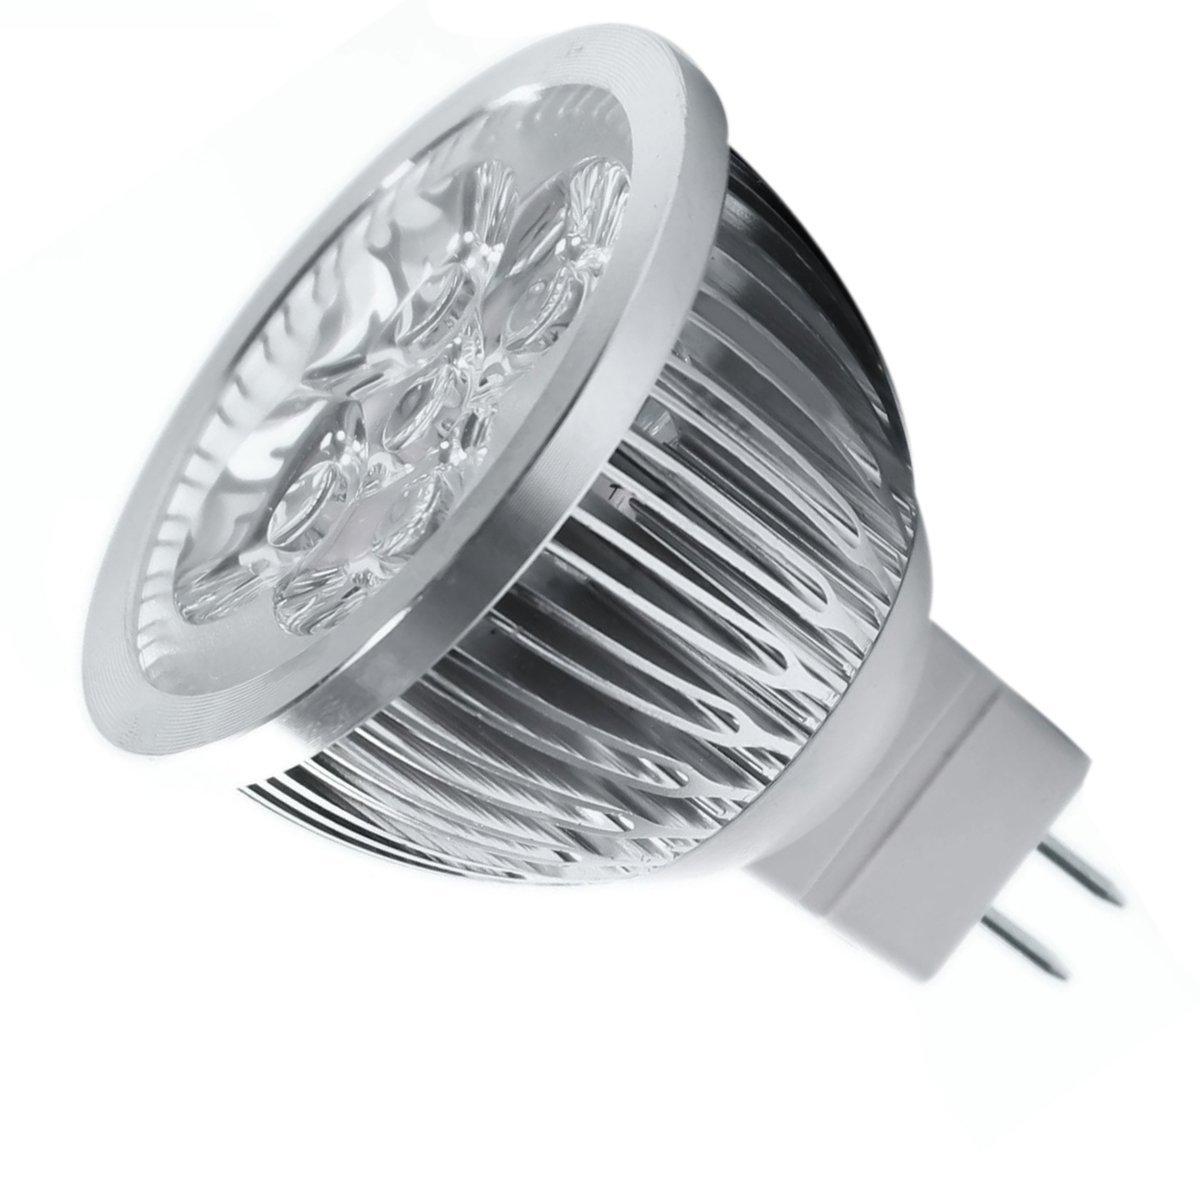 8 * 4W Dimmable MR16 LED Bulb - 3200K Warm White LED Spotlight - 50Watt Equ A6K4